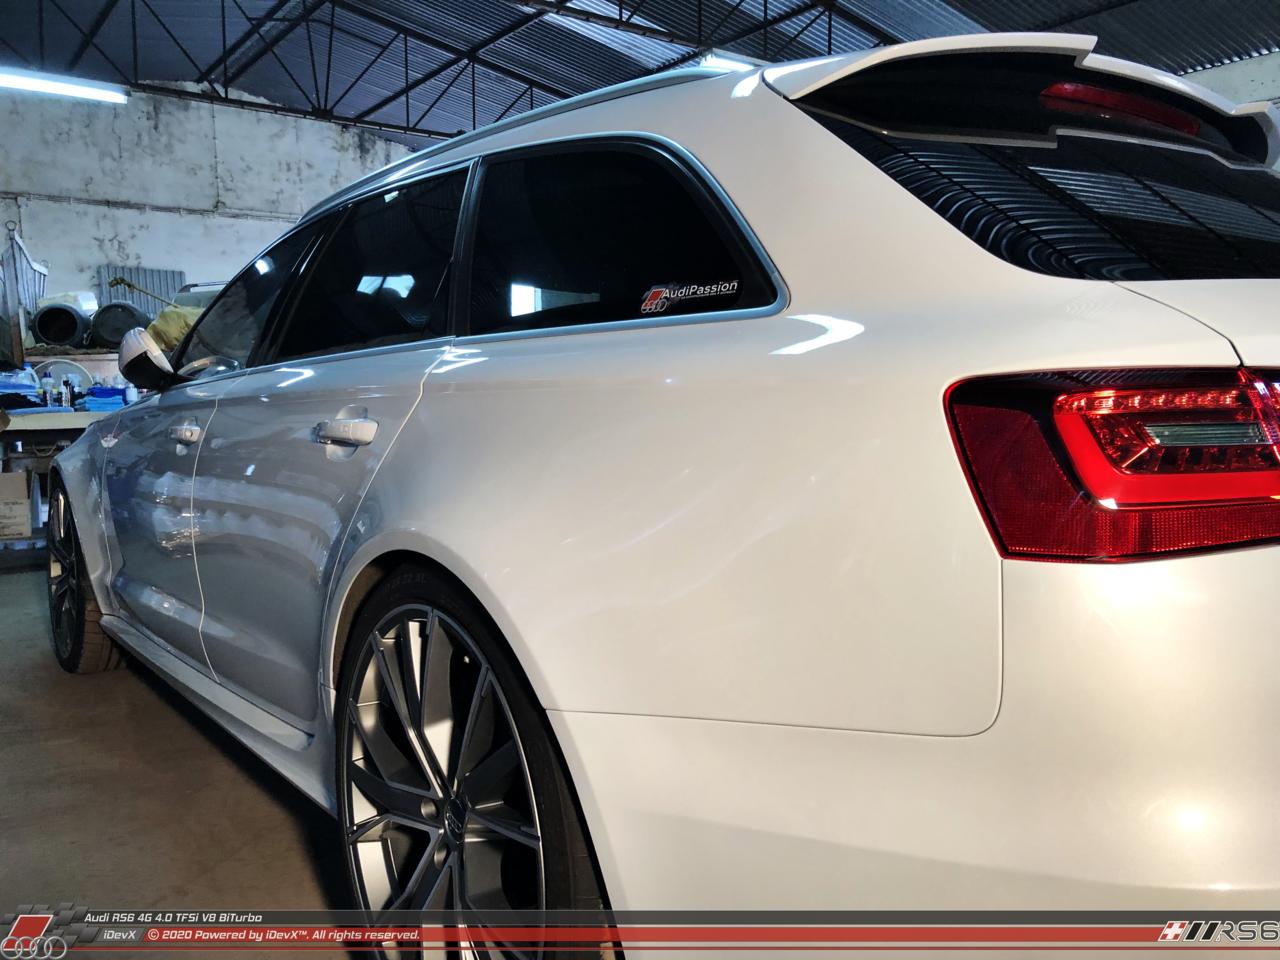 05_08.2019_Audi-RS6_iDevX_004.png